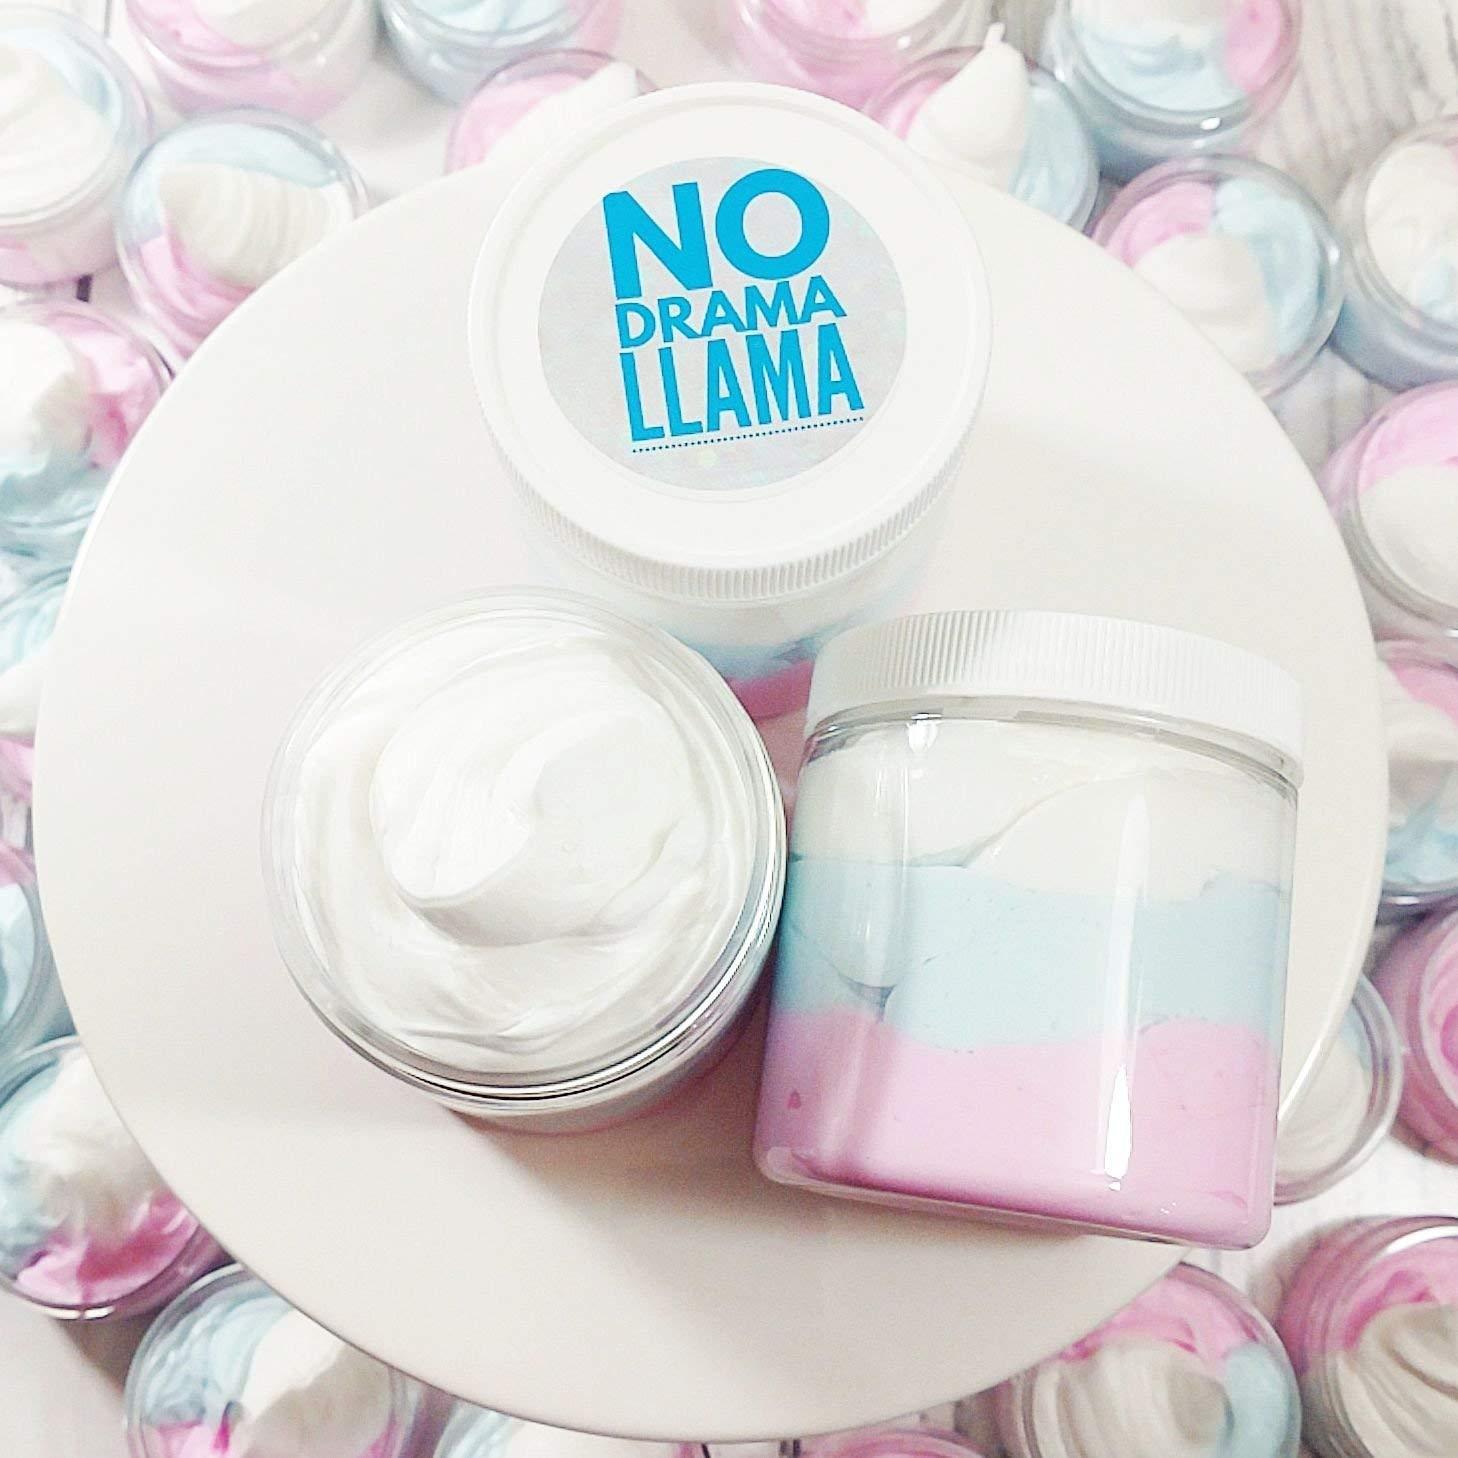 No Drama Llama Whipped Body Butter Lotion Vanilla Birthday Cake Scent Mama